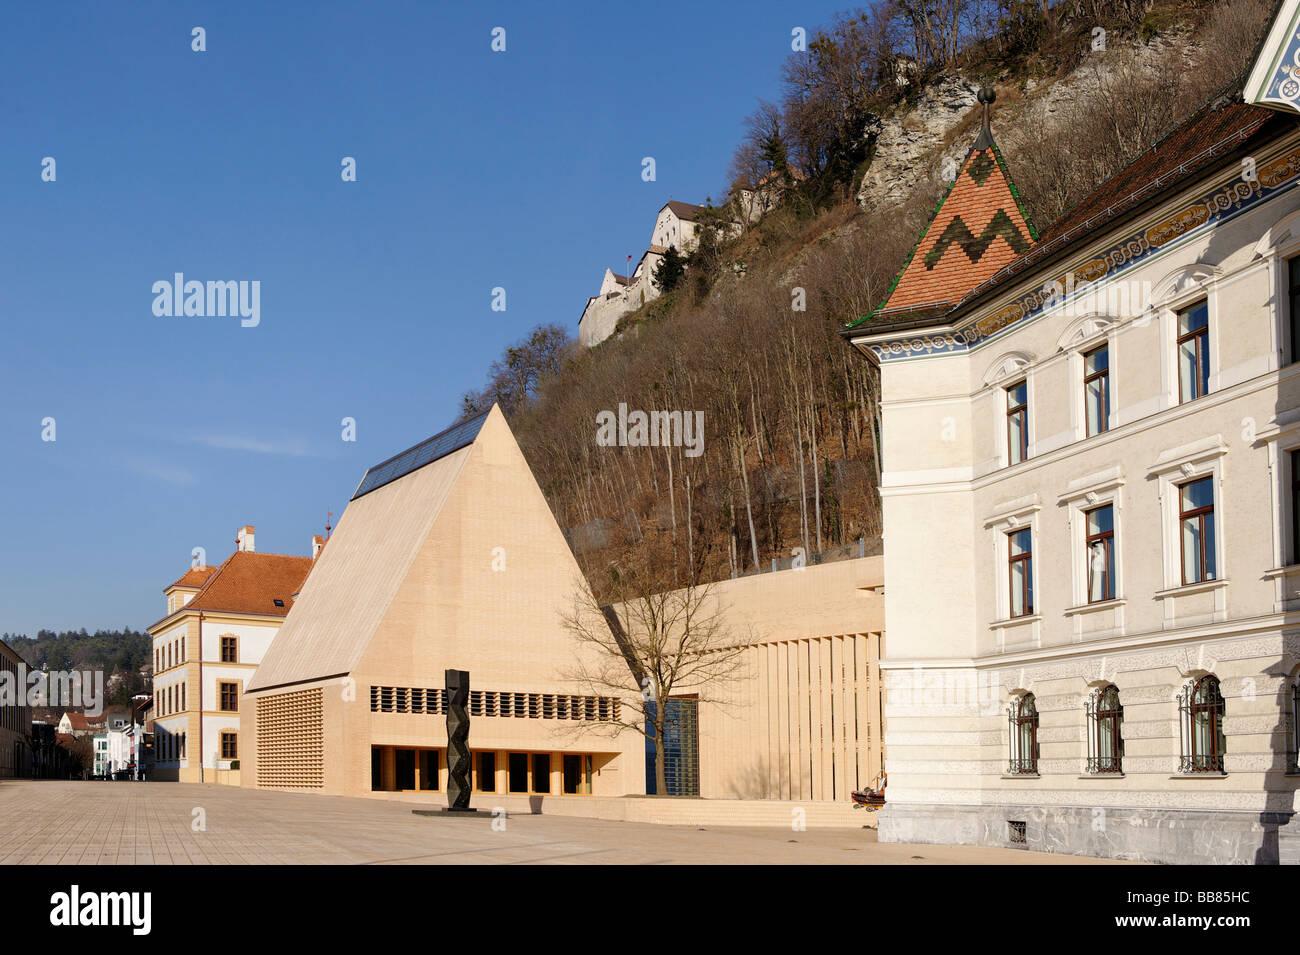 Government building, Vaduz, Liechtenstein principality, Europe Stock Photo